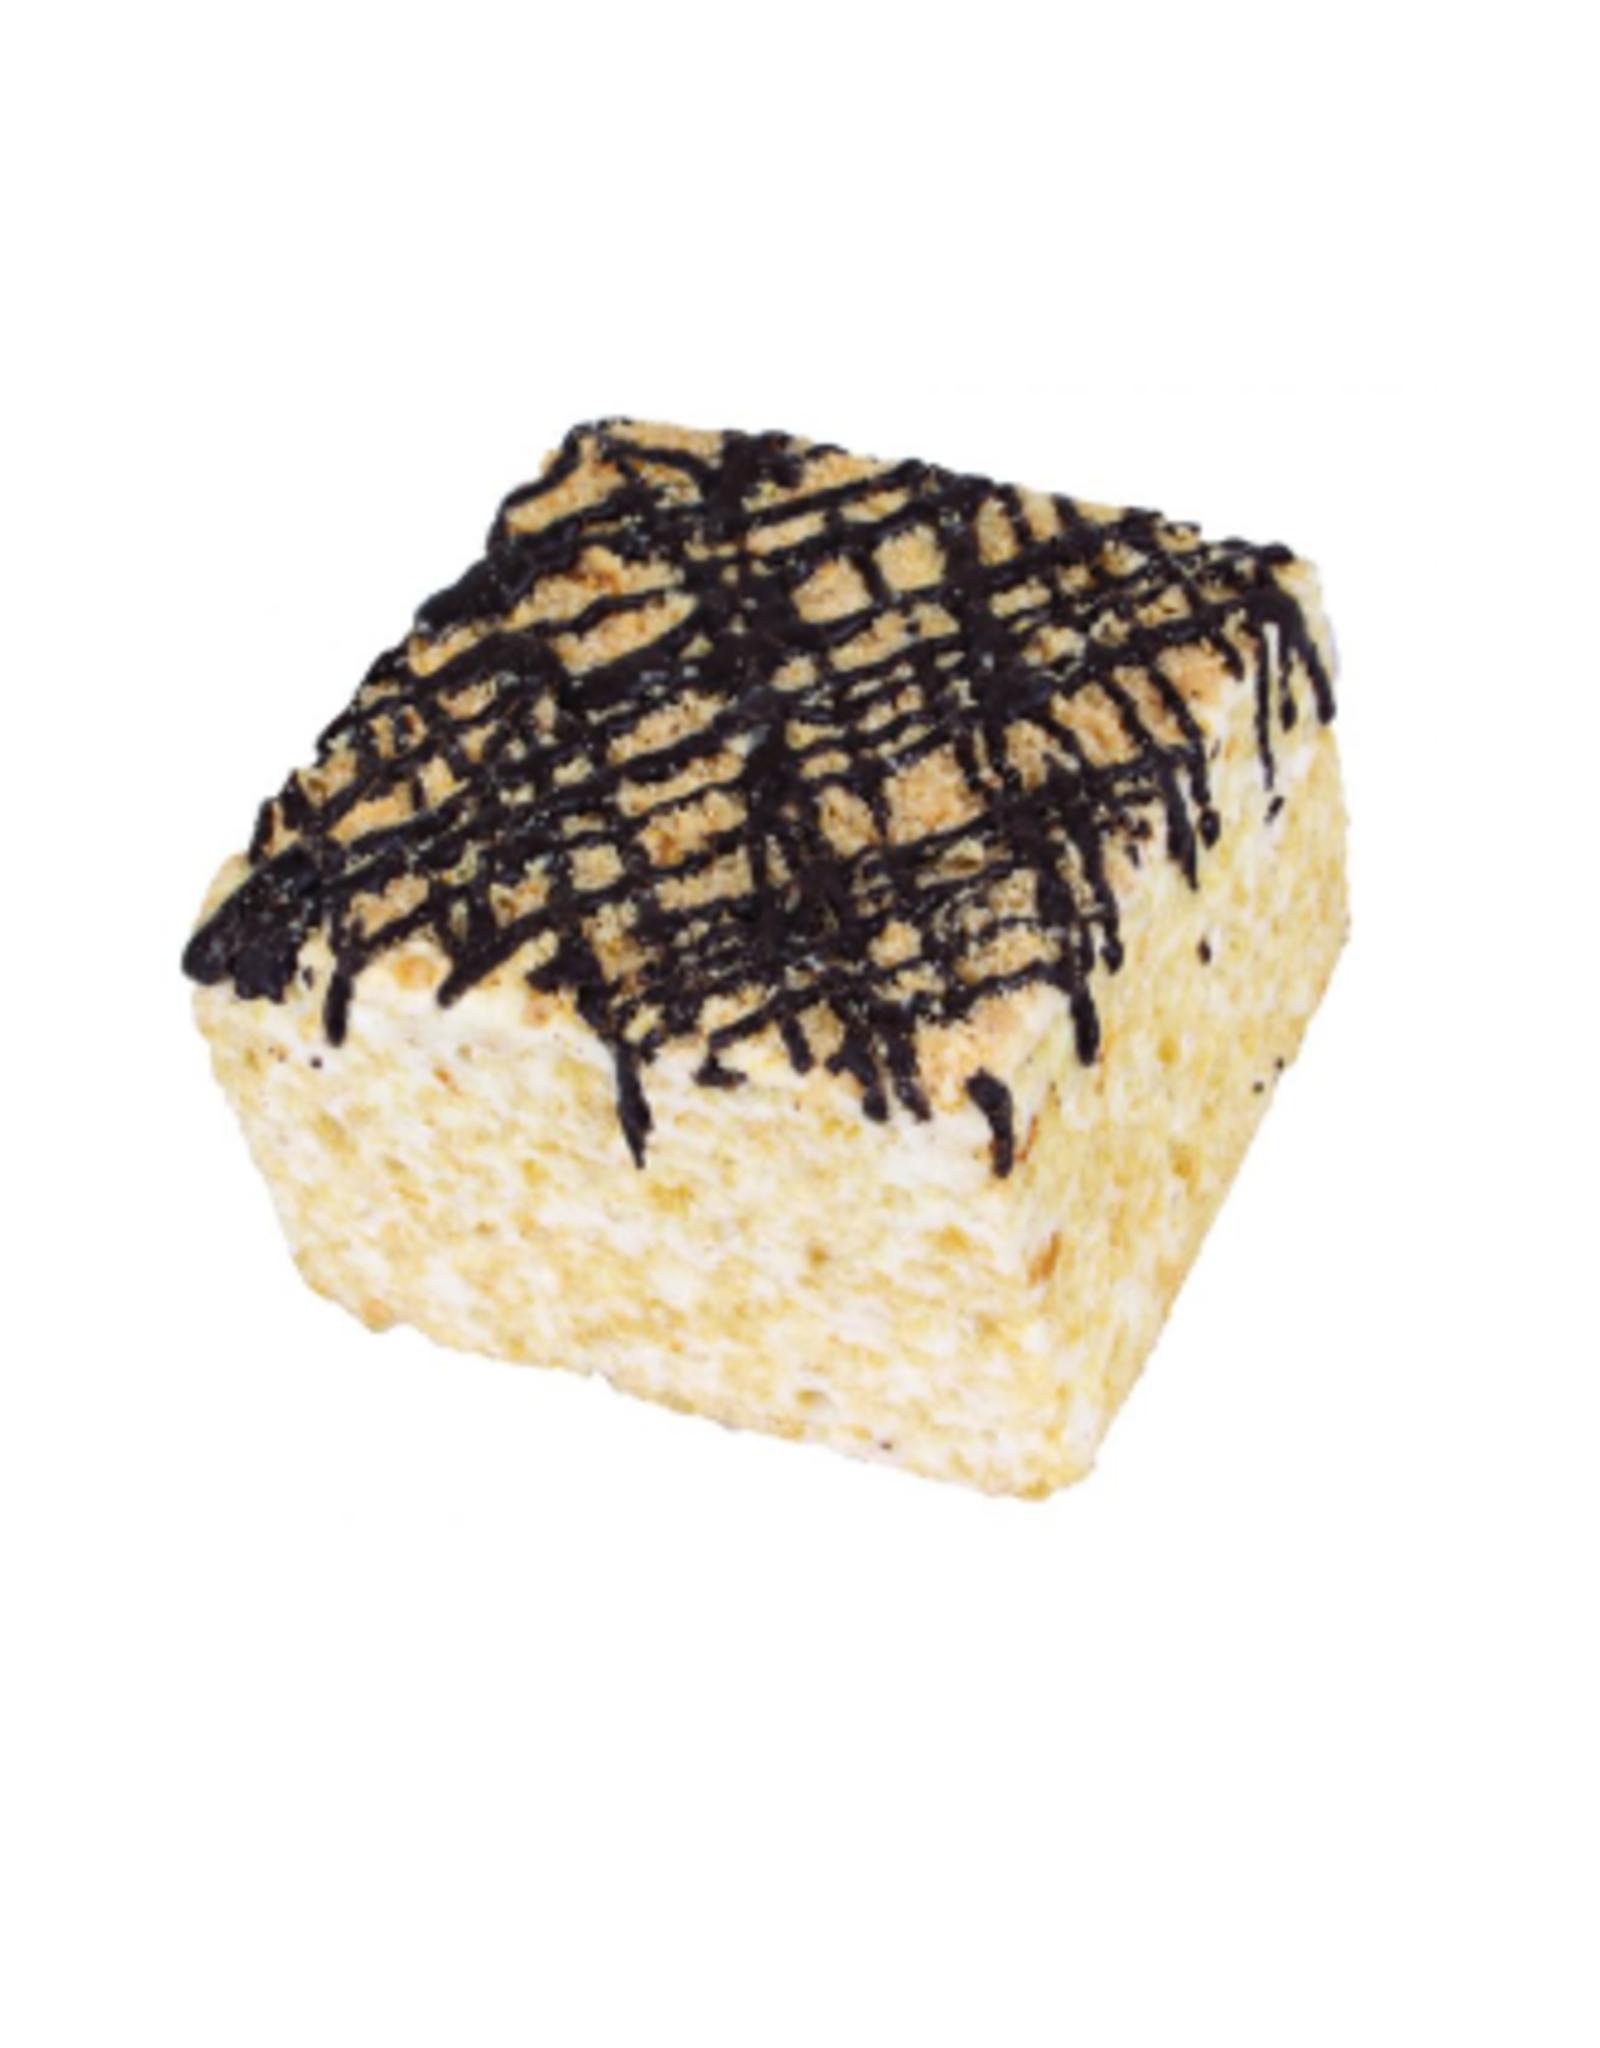 The Crispery CrispyCakes, Chocolate Toffee Crunch*